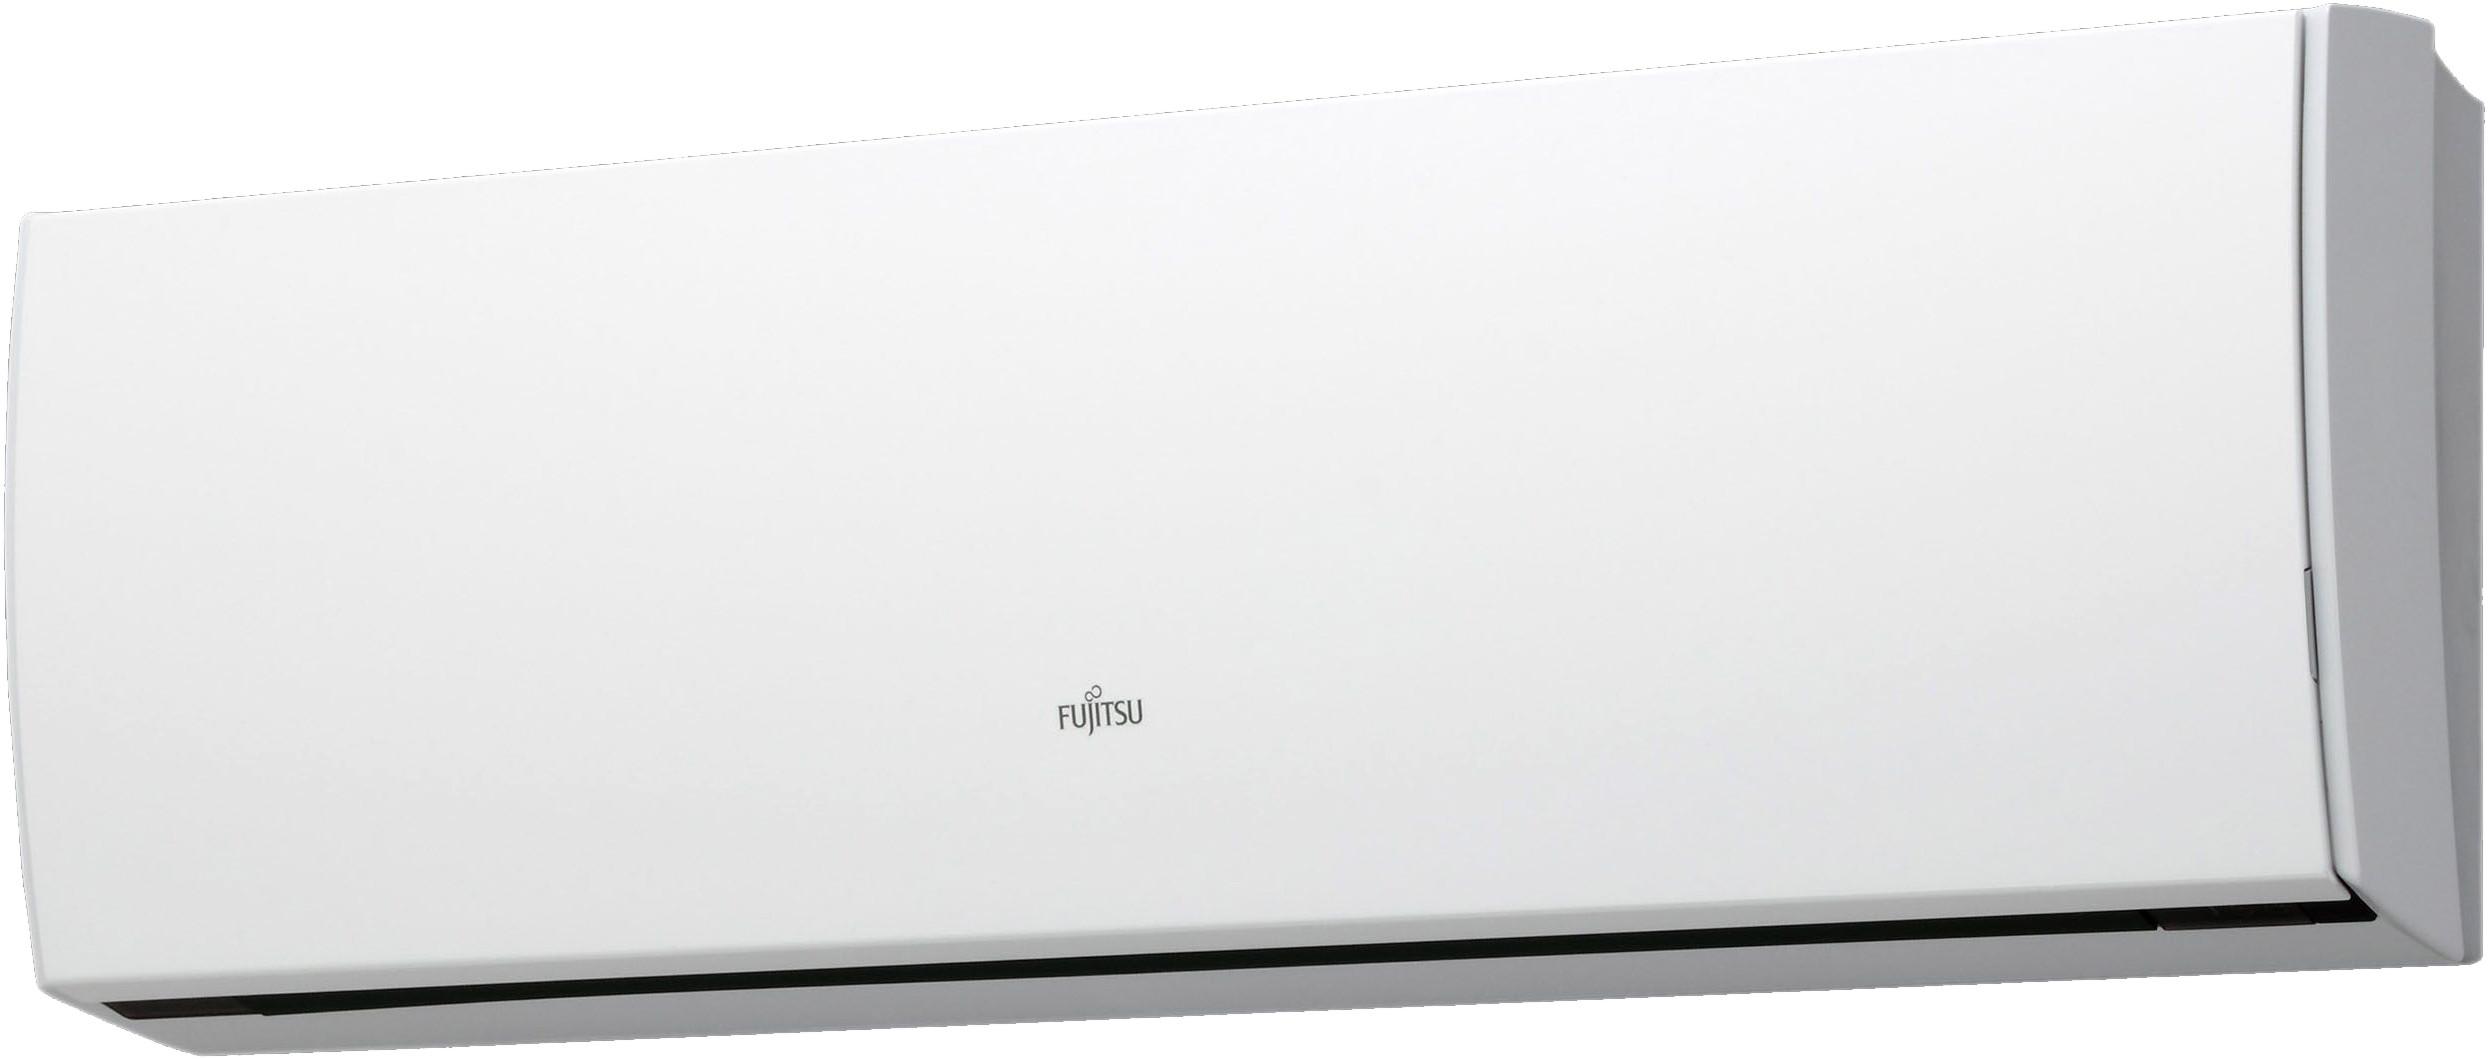 Кондиционер Fujitsu ASYG14LUCA